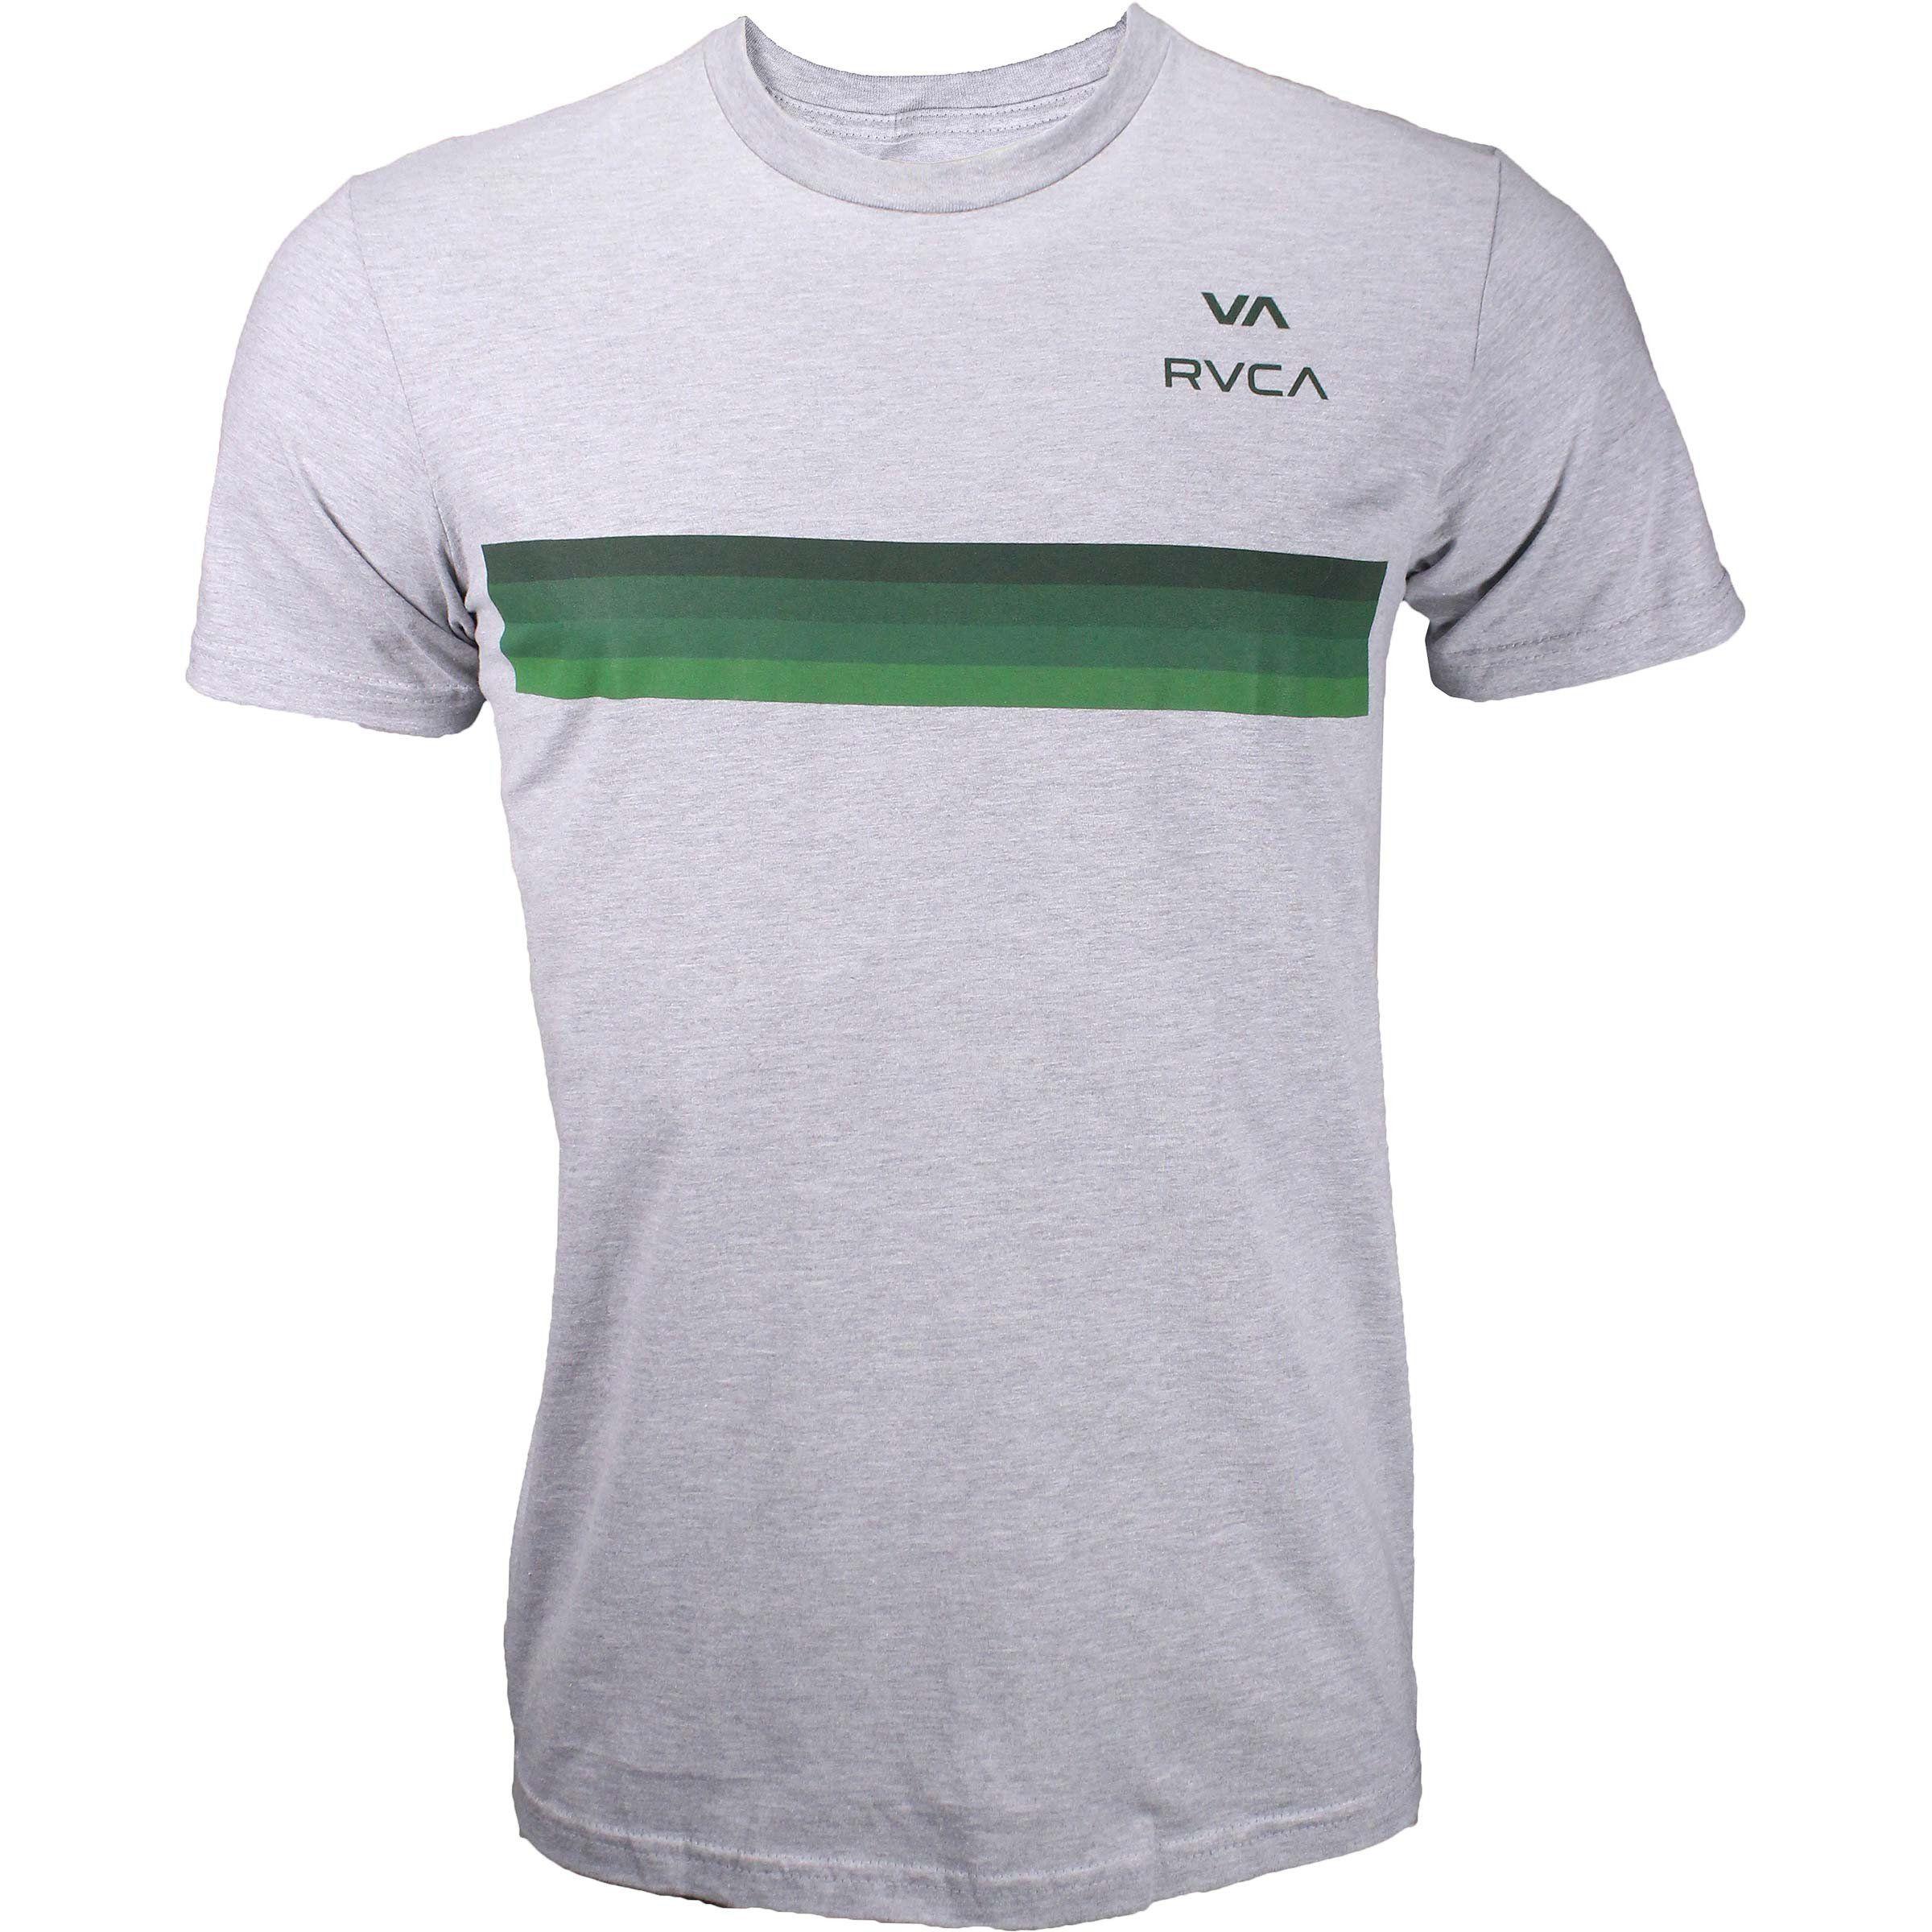 Rvca Shirts Stand For | ANLIS